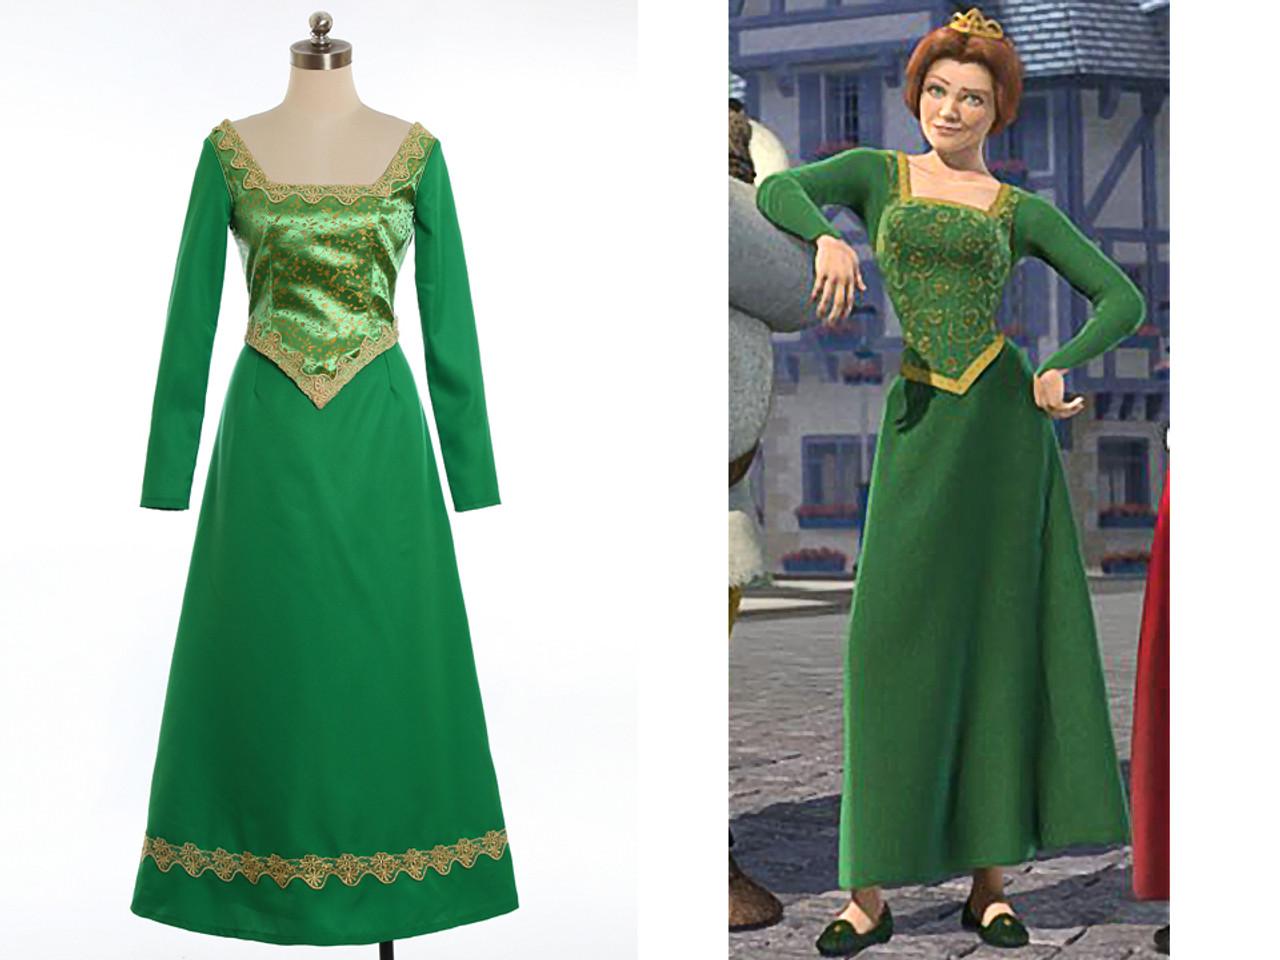 Disney Shrek Cosplay Princess Fiona Costume Outfit